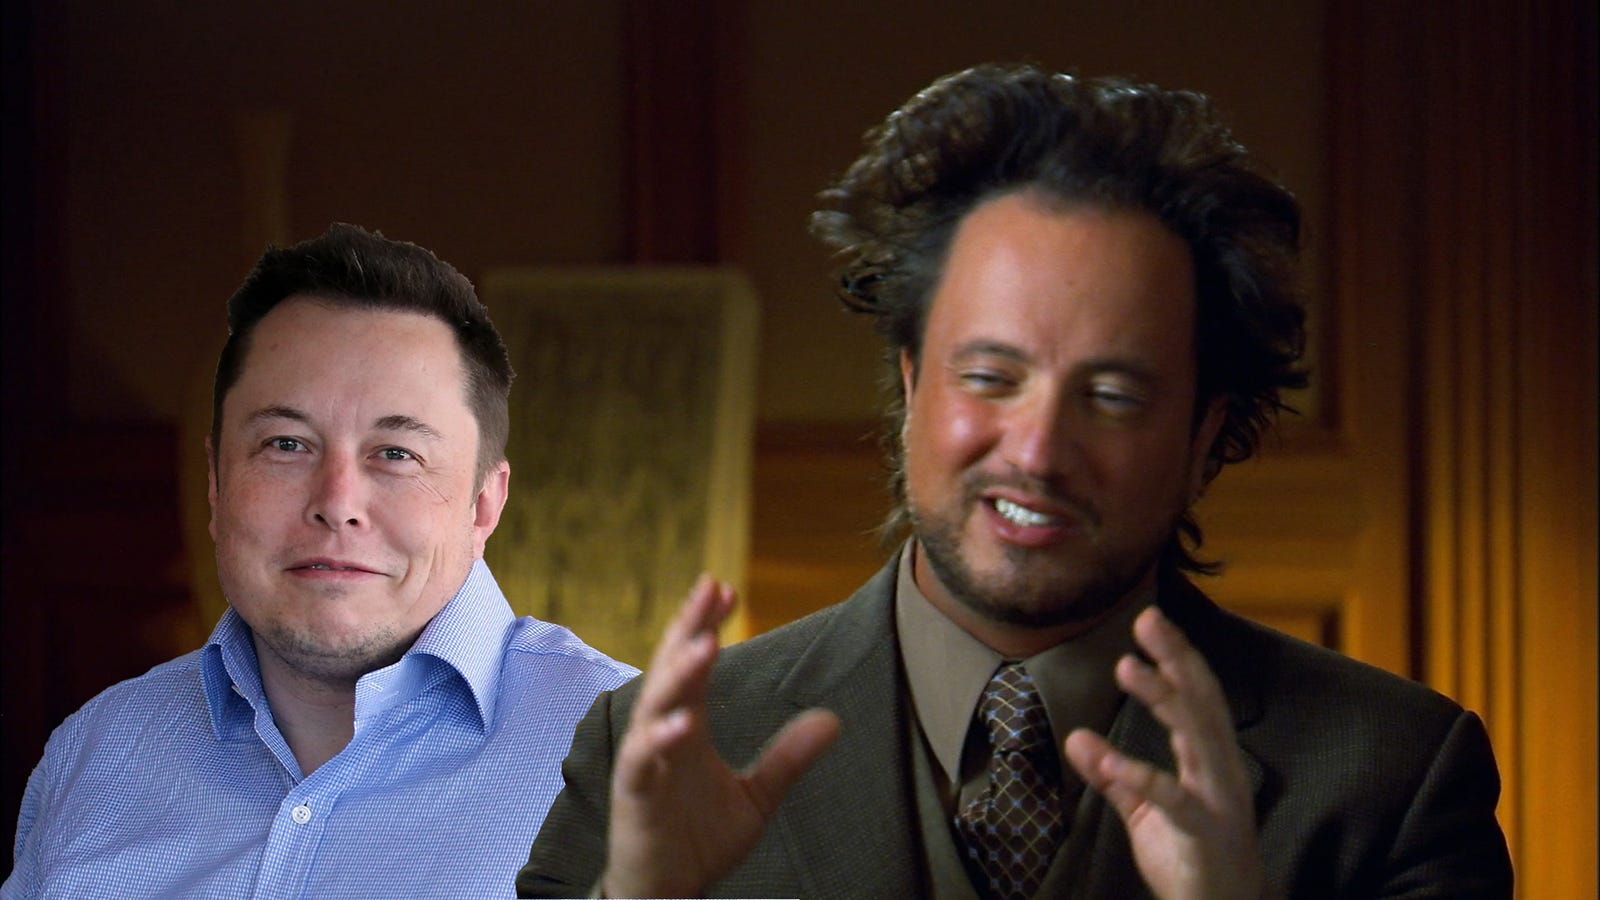 Evidence That Elon Musk Is an Alien